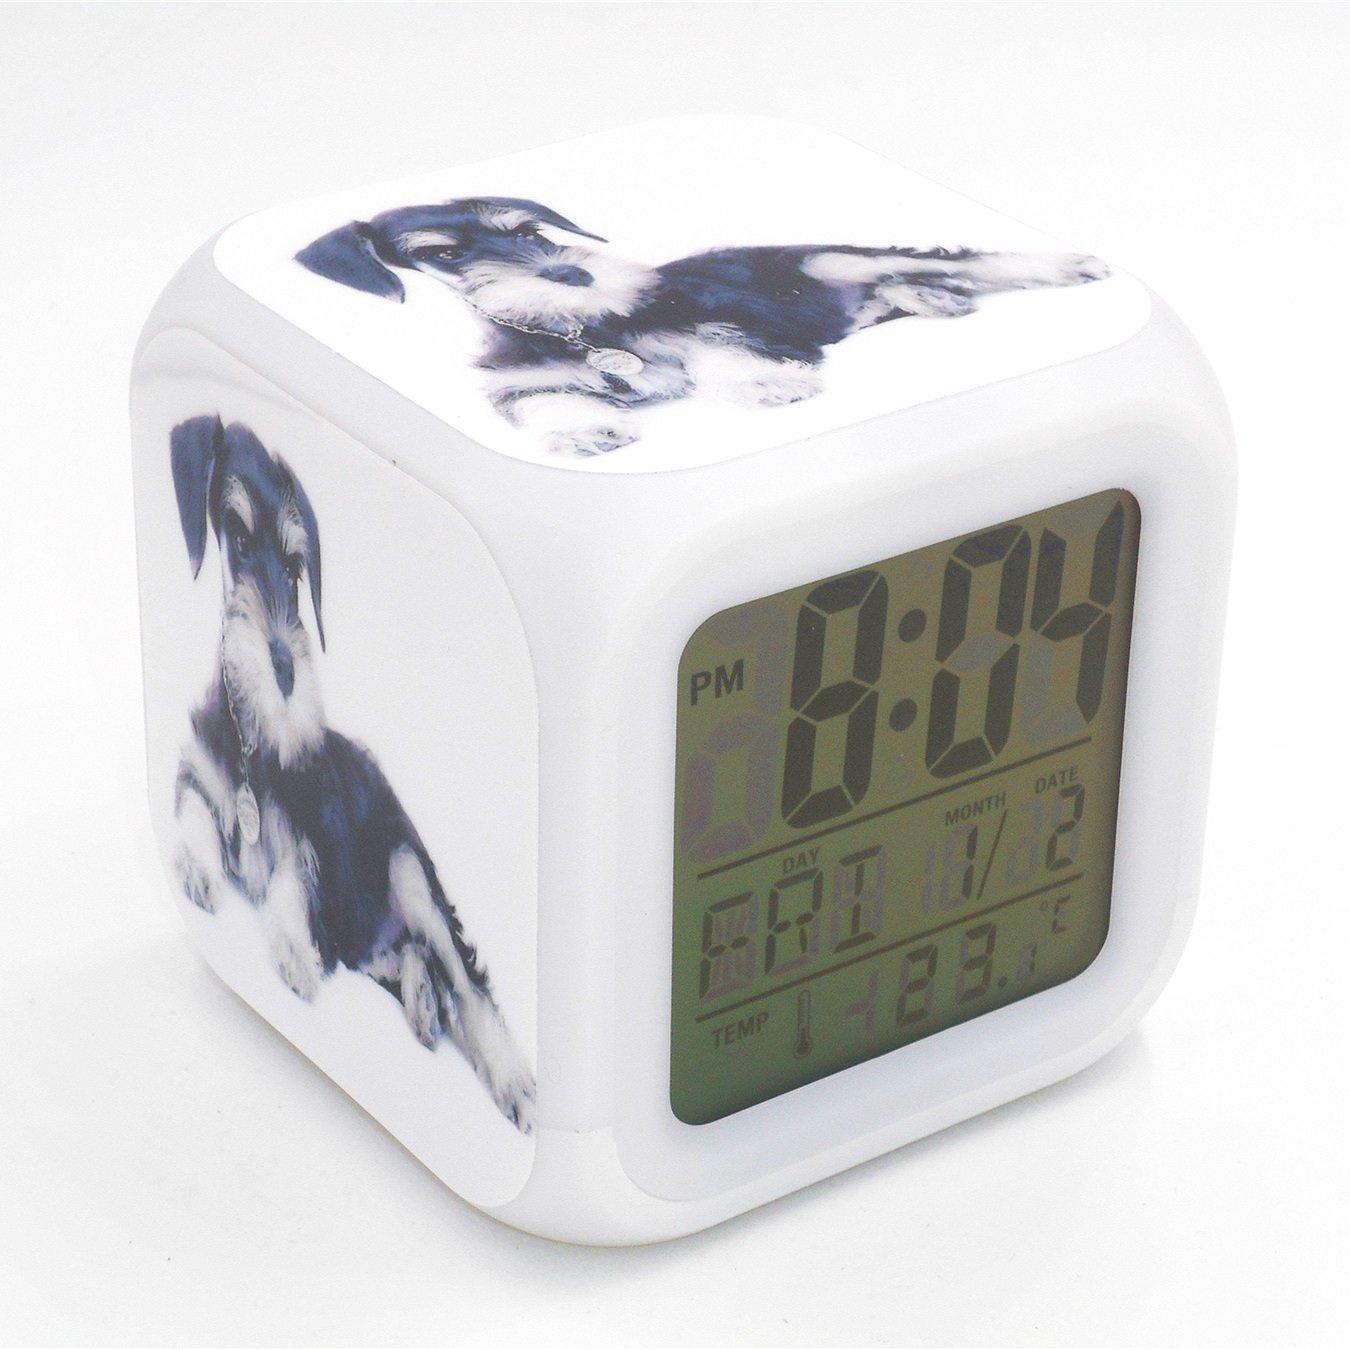 Boyan Led Alarm Clock Schnauzer Dog Animal Design Creative Desk Table Clock Glowing Electric Led Digital Alarm Clock Kids Toy Gift